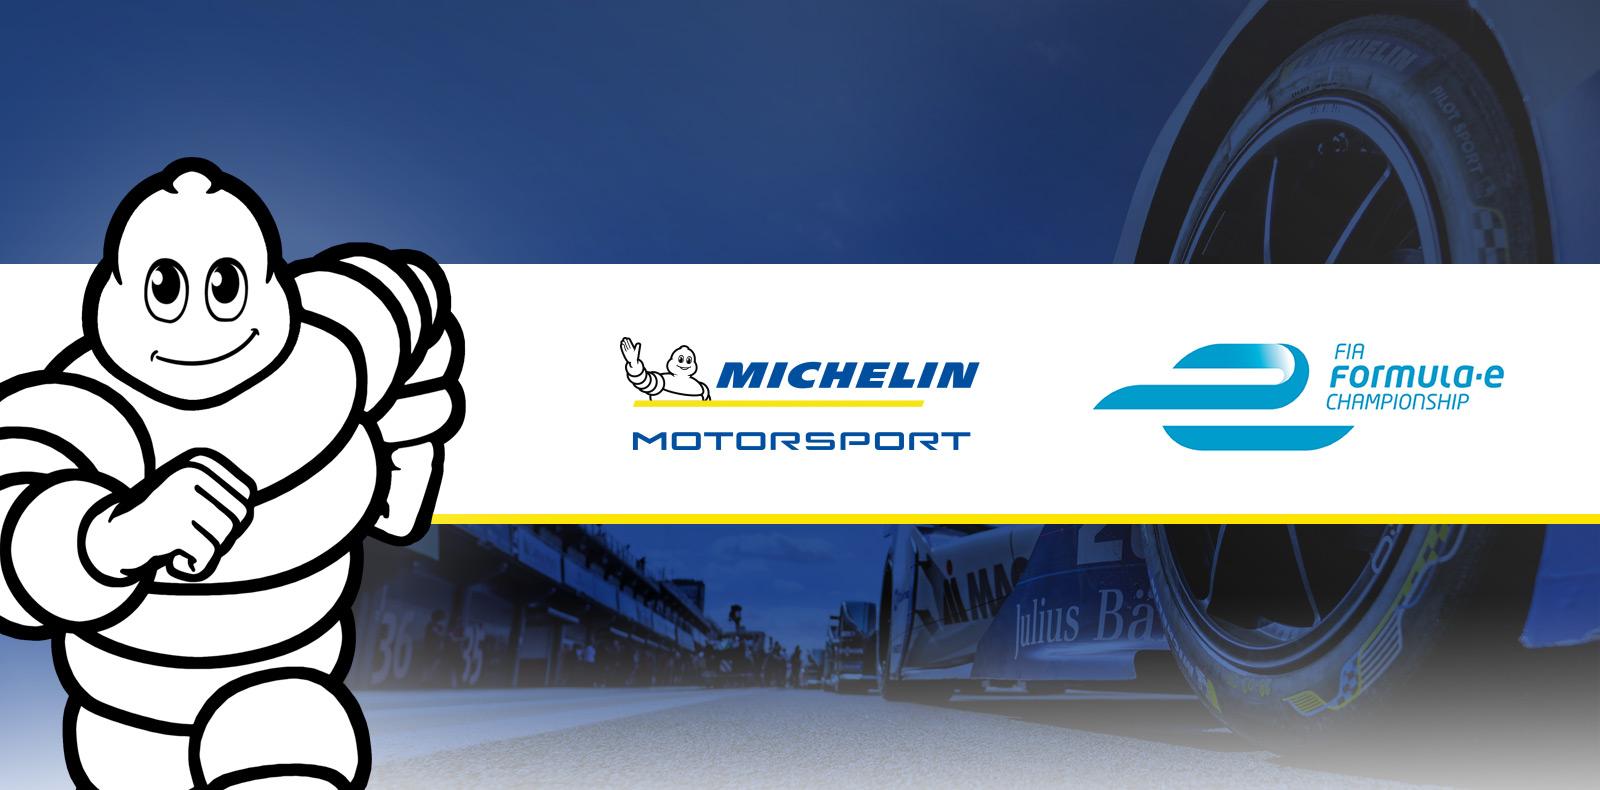 0eeabb66b8e5 Competition Archives - Michelin Corporate